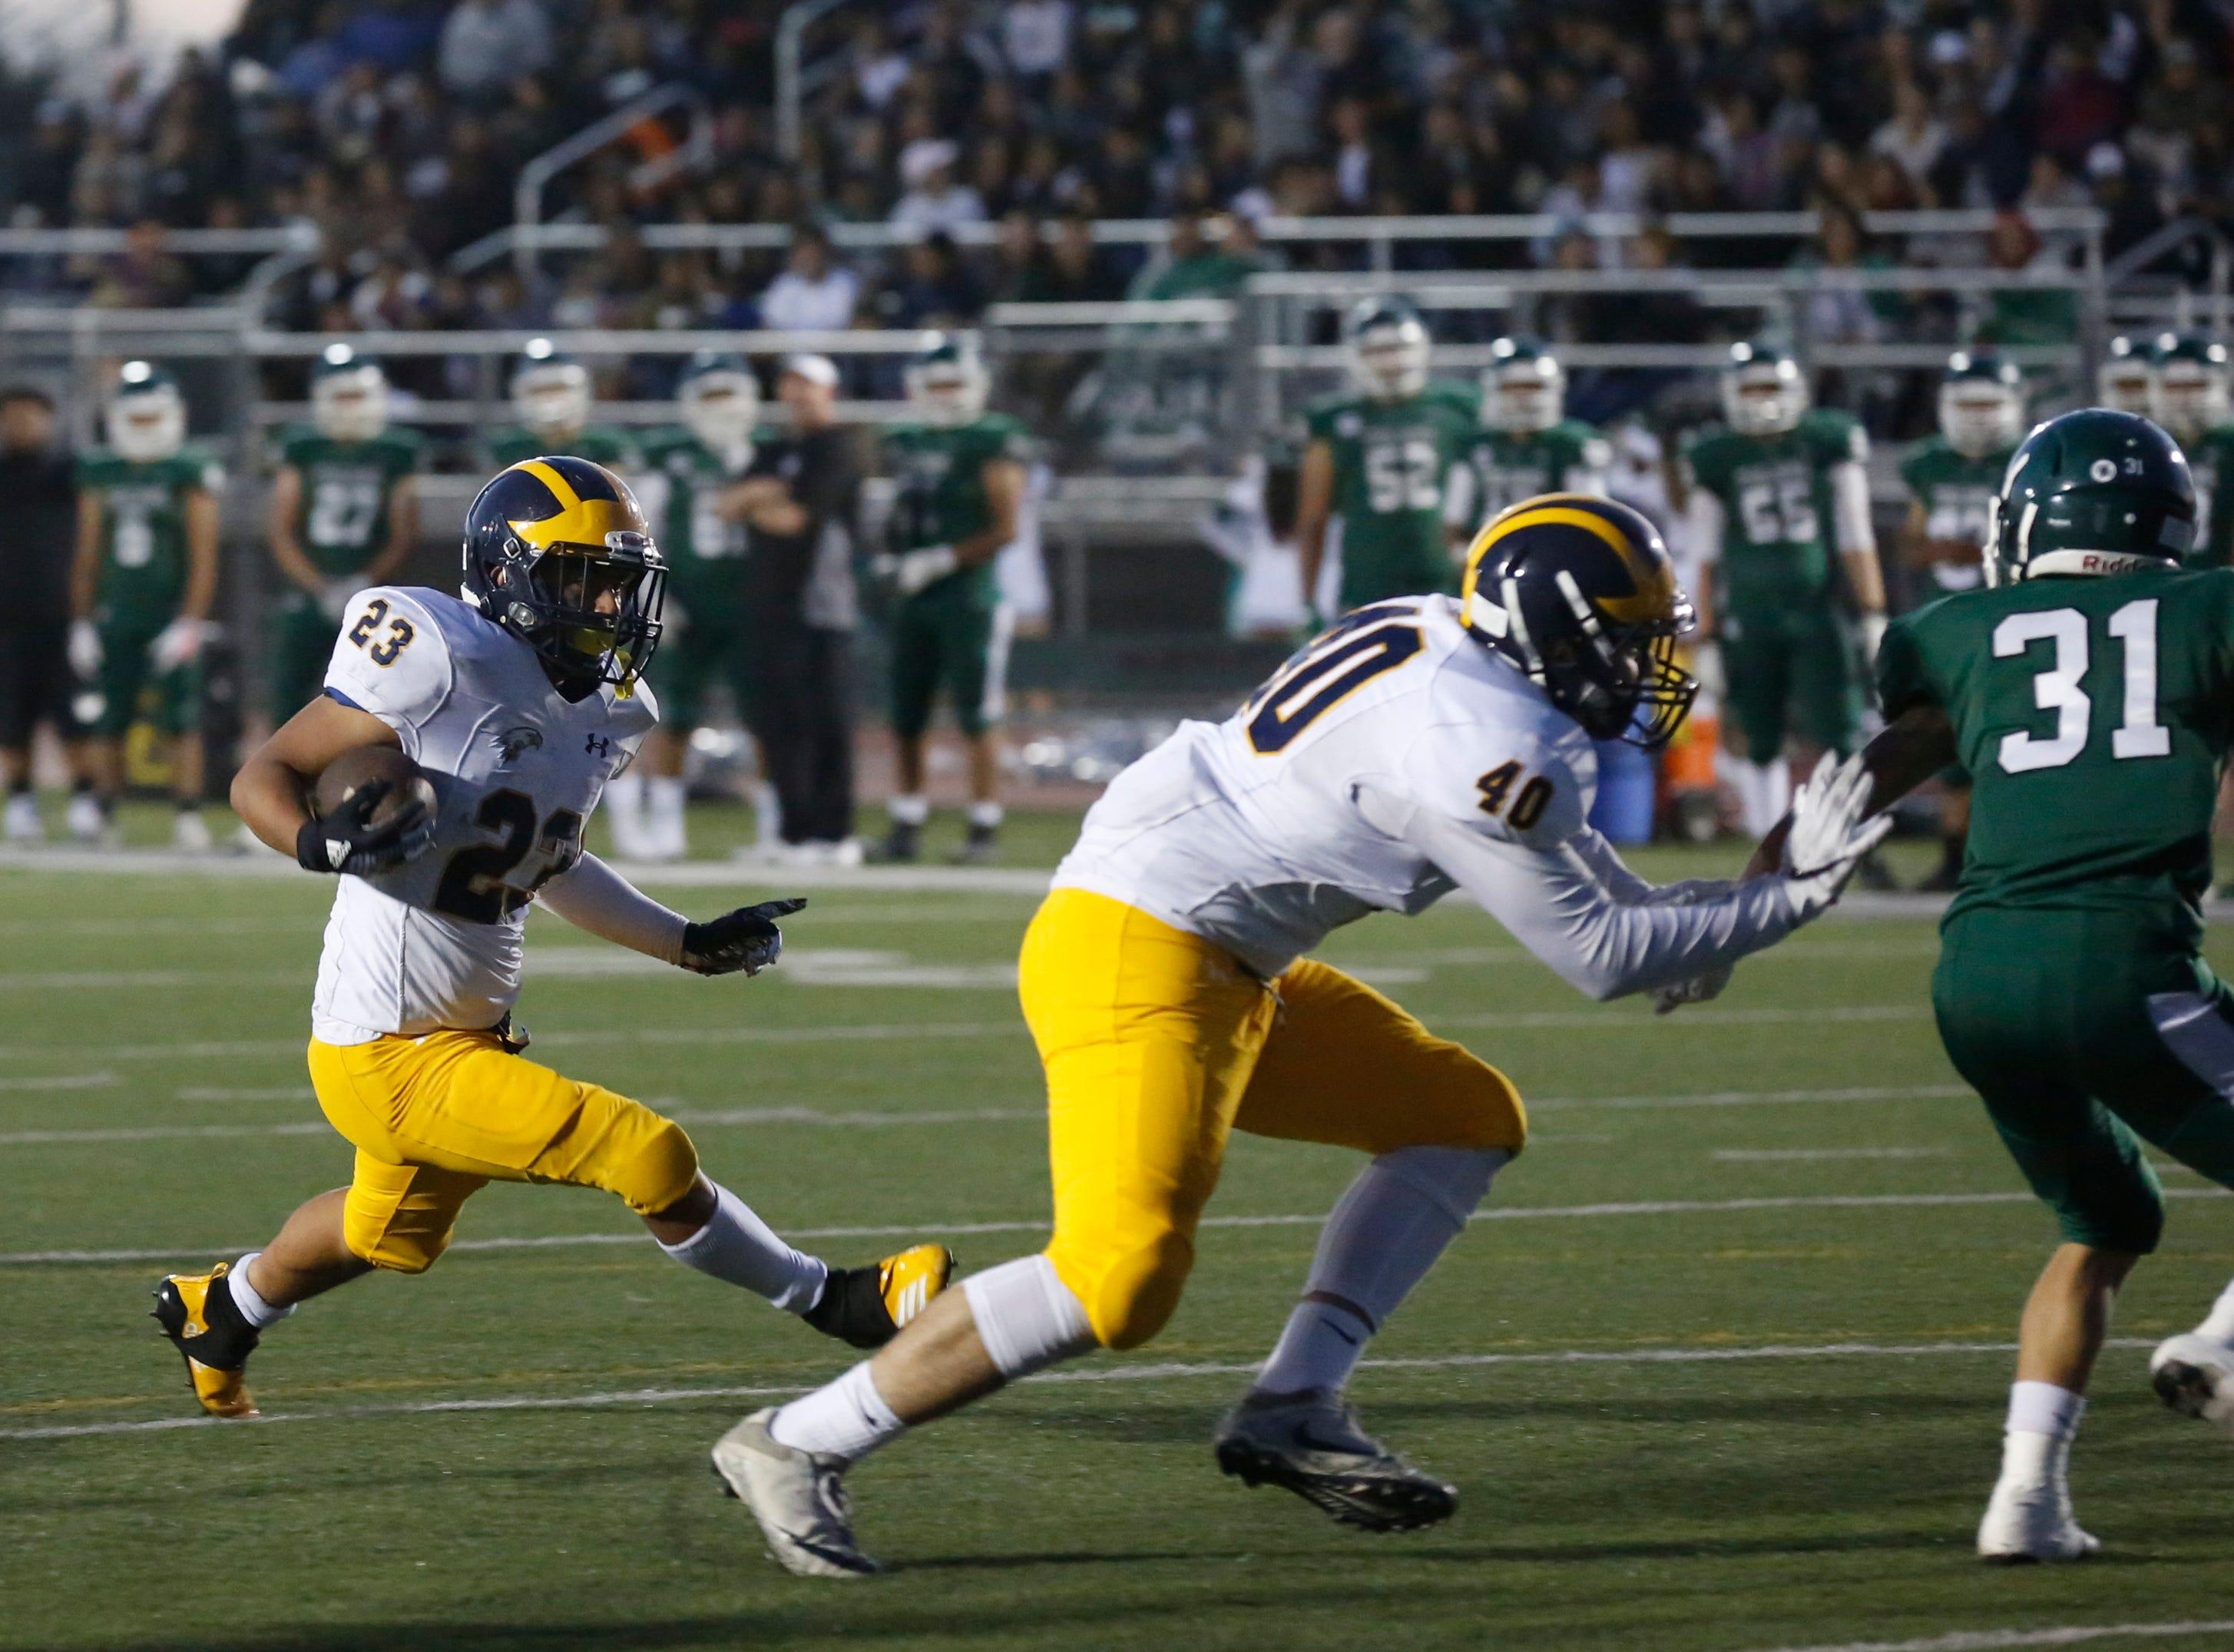 Everett Alvarez's Elijah Alvarez runs the ball during football at Alisal High School in Salinas on Friday August 31, 2018. (Photo By David Royal)